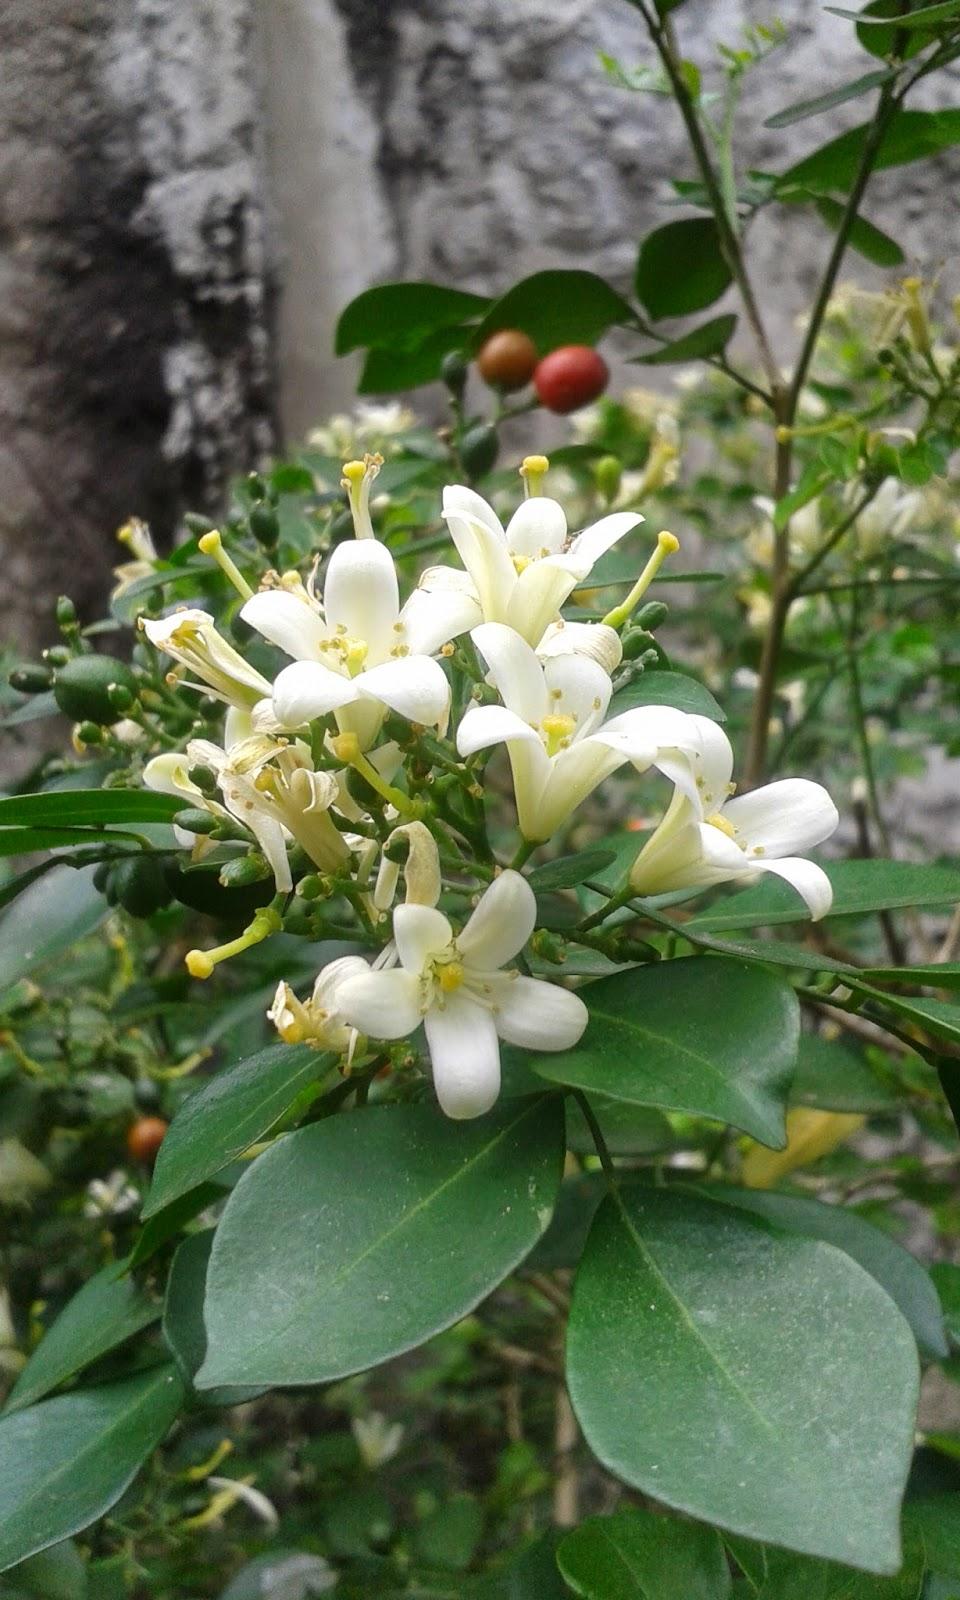 Contoh Bunga Hermafrodit : contoh, bunga, hermafrodit, Mengapa, Bunga, Tanaman, Jeruk, Nipis, Disebut, Hermafrodit, Berbagi, Tanam